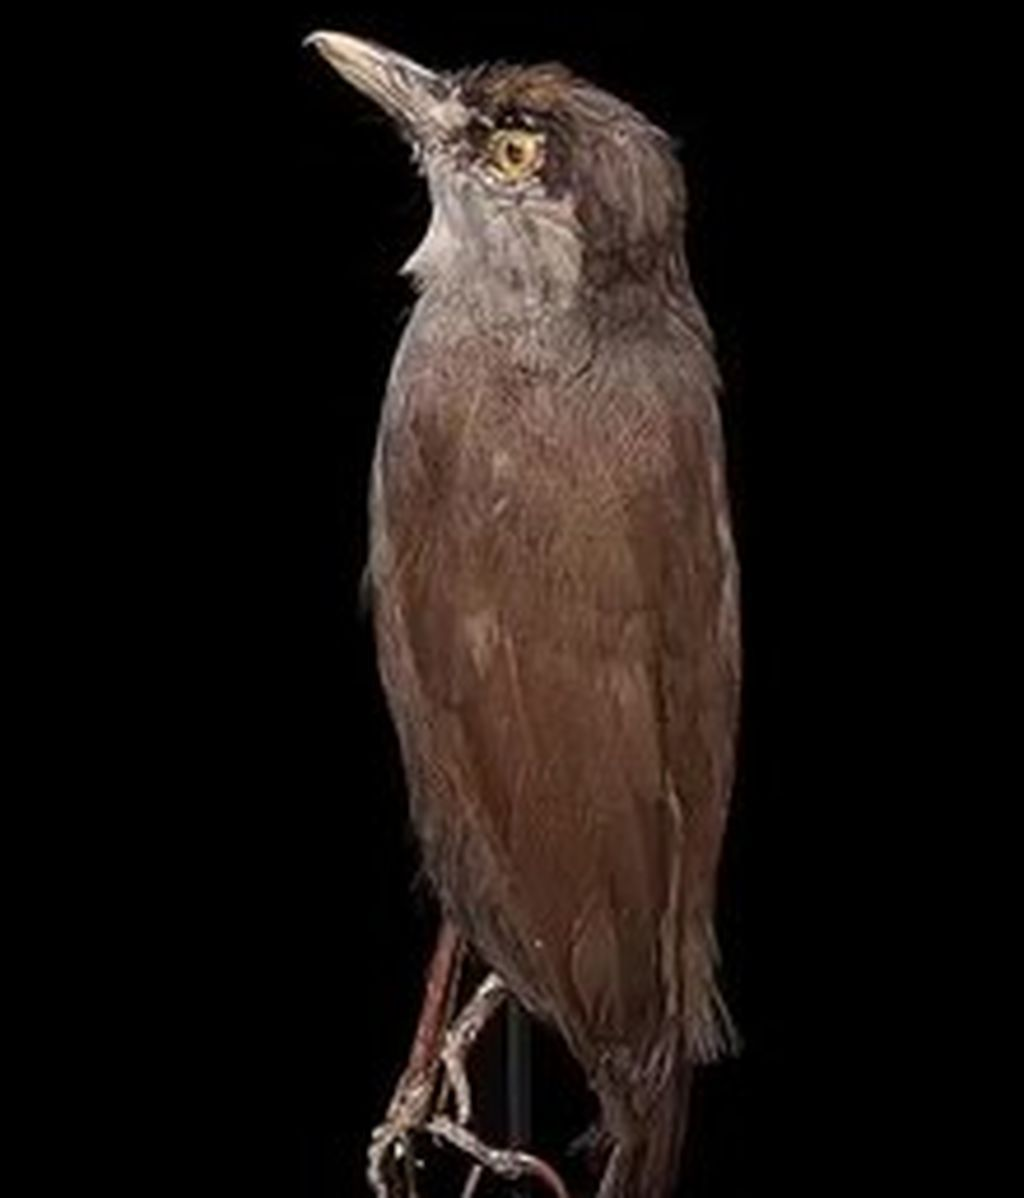 220px--Naturalis_Biodiversity_Center_-_RMNH.AVES.89412_-_Malacocincla_perspicillata_(Bonaparte,_1850)_-_Black-browed_Babbler_-_specimen_-_video.webm